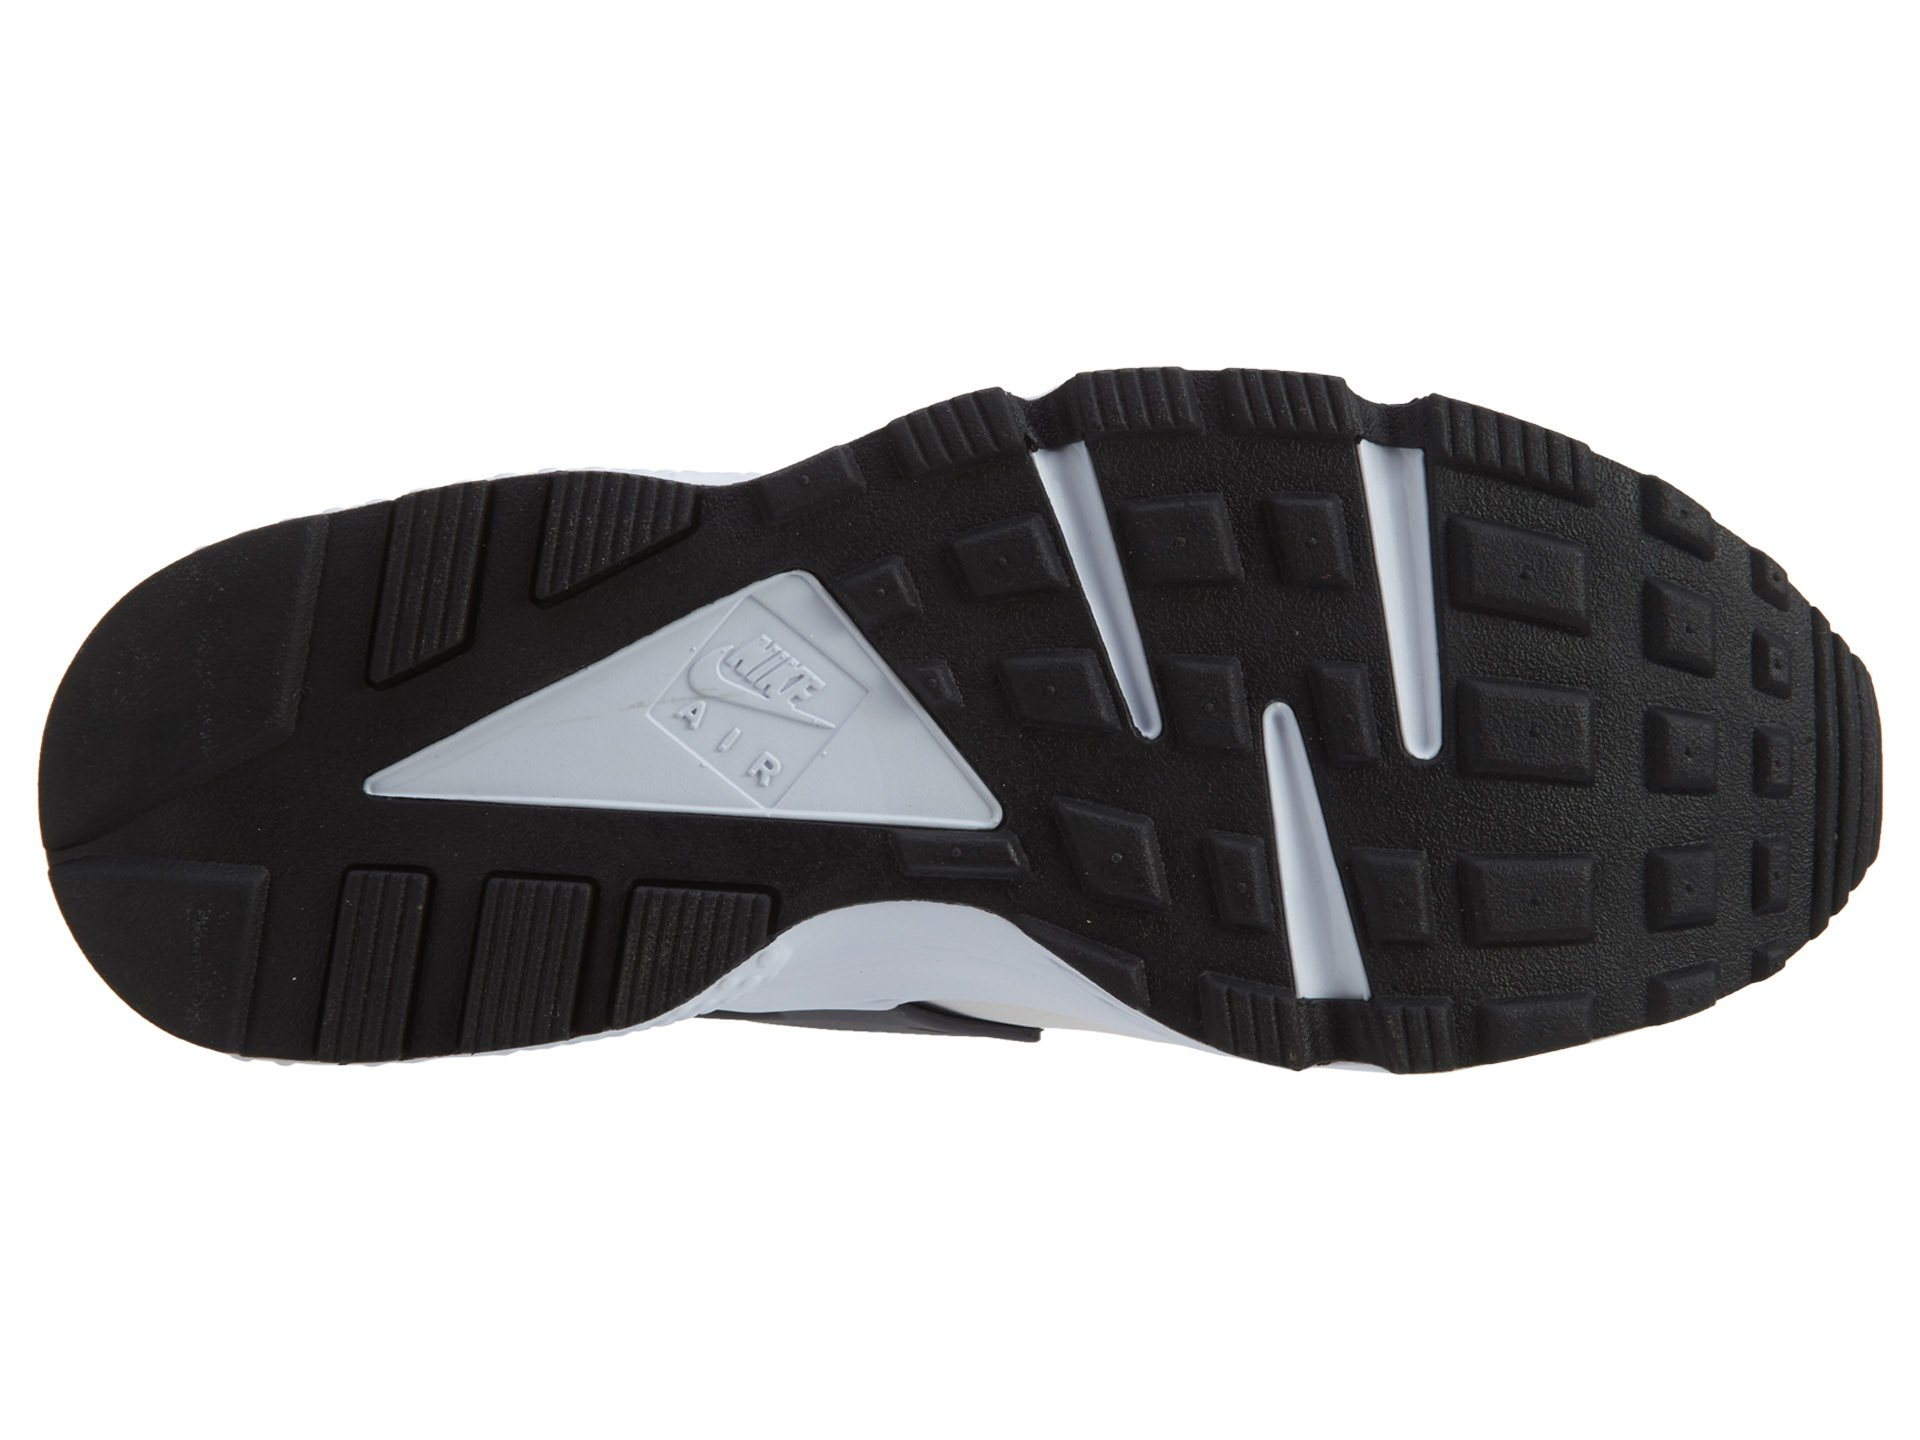 Nike Men's Air Huarache Actn Green/Vvd Orng Phntm Wht Running Shoe 10.5 Men US by NIKE (Image #7)